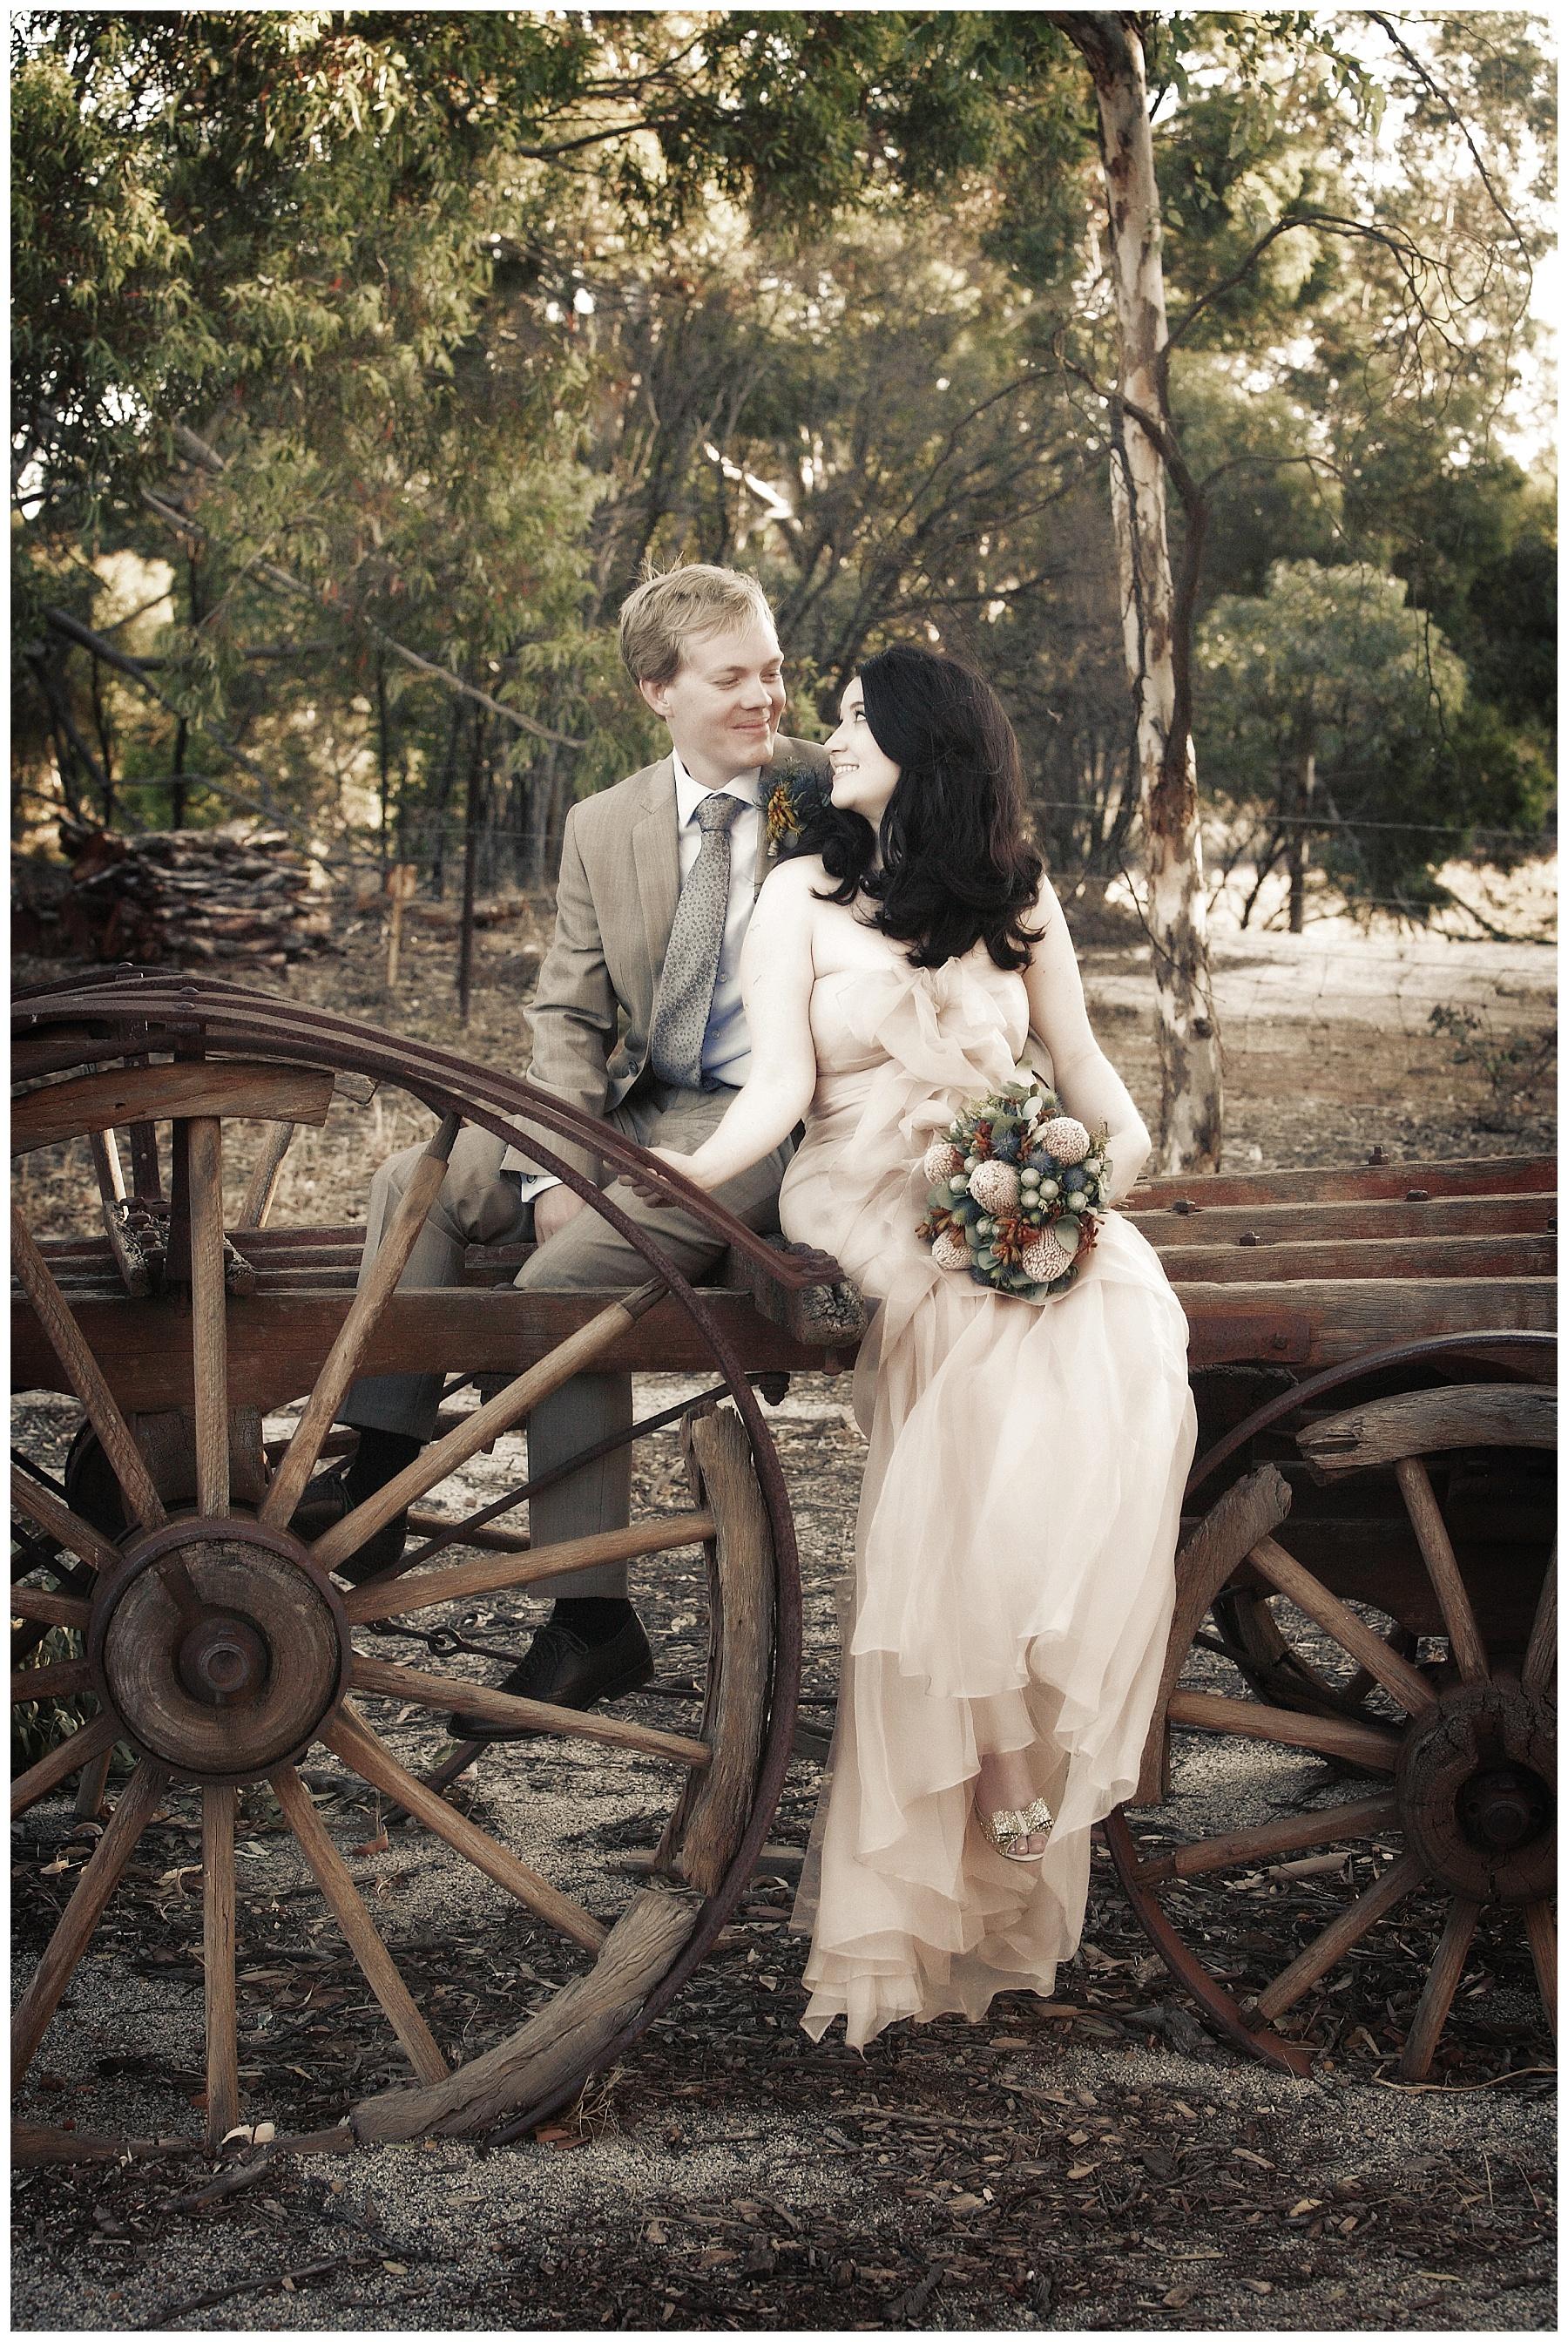 Wedding Photographer Perth - New Norcia Wedding